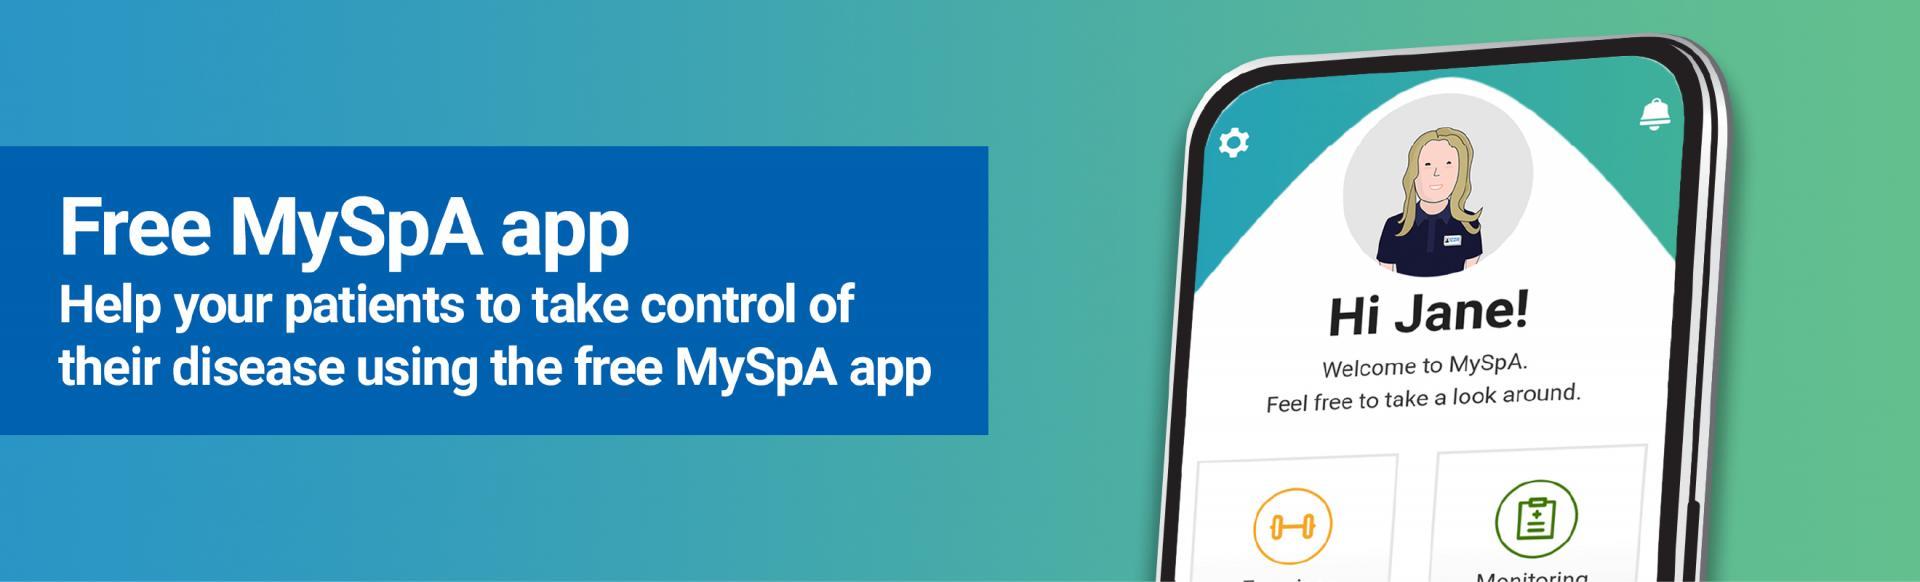 Top banner. Free MySpA app.